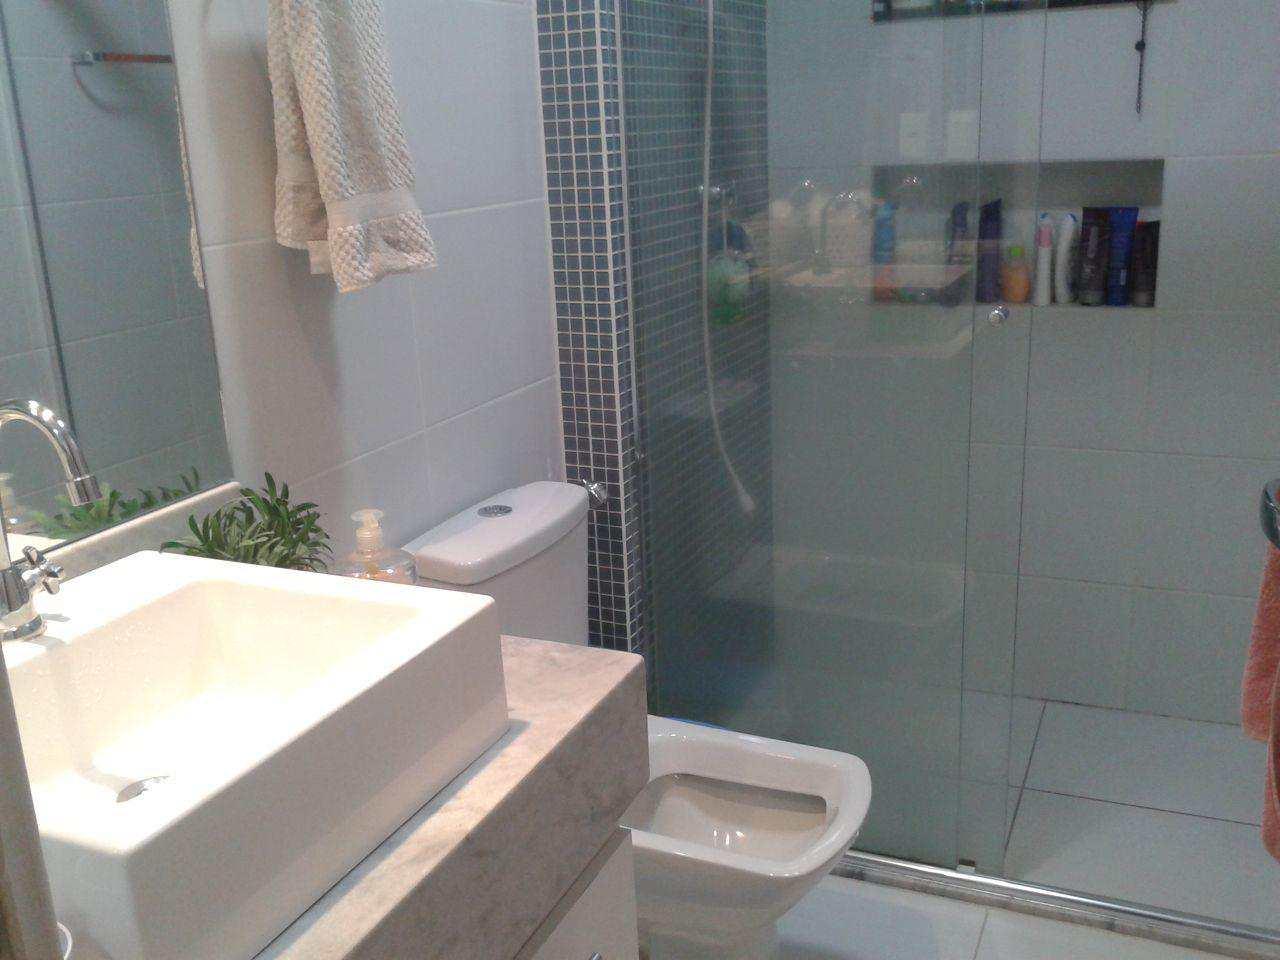 Apartamento com 2 dorms, Monte Verde, Santa Rita do Sapucaí - R$ 275 mil, Cod: 204